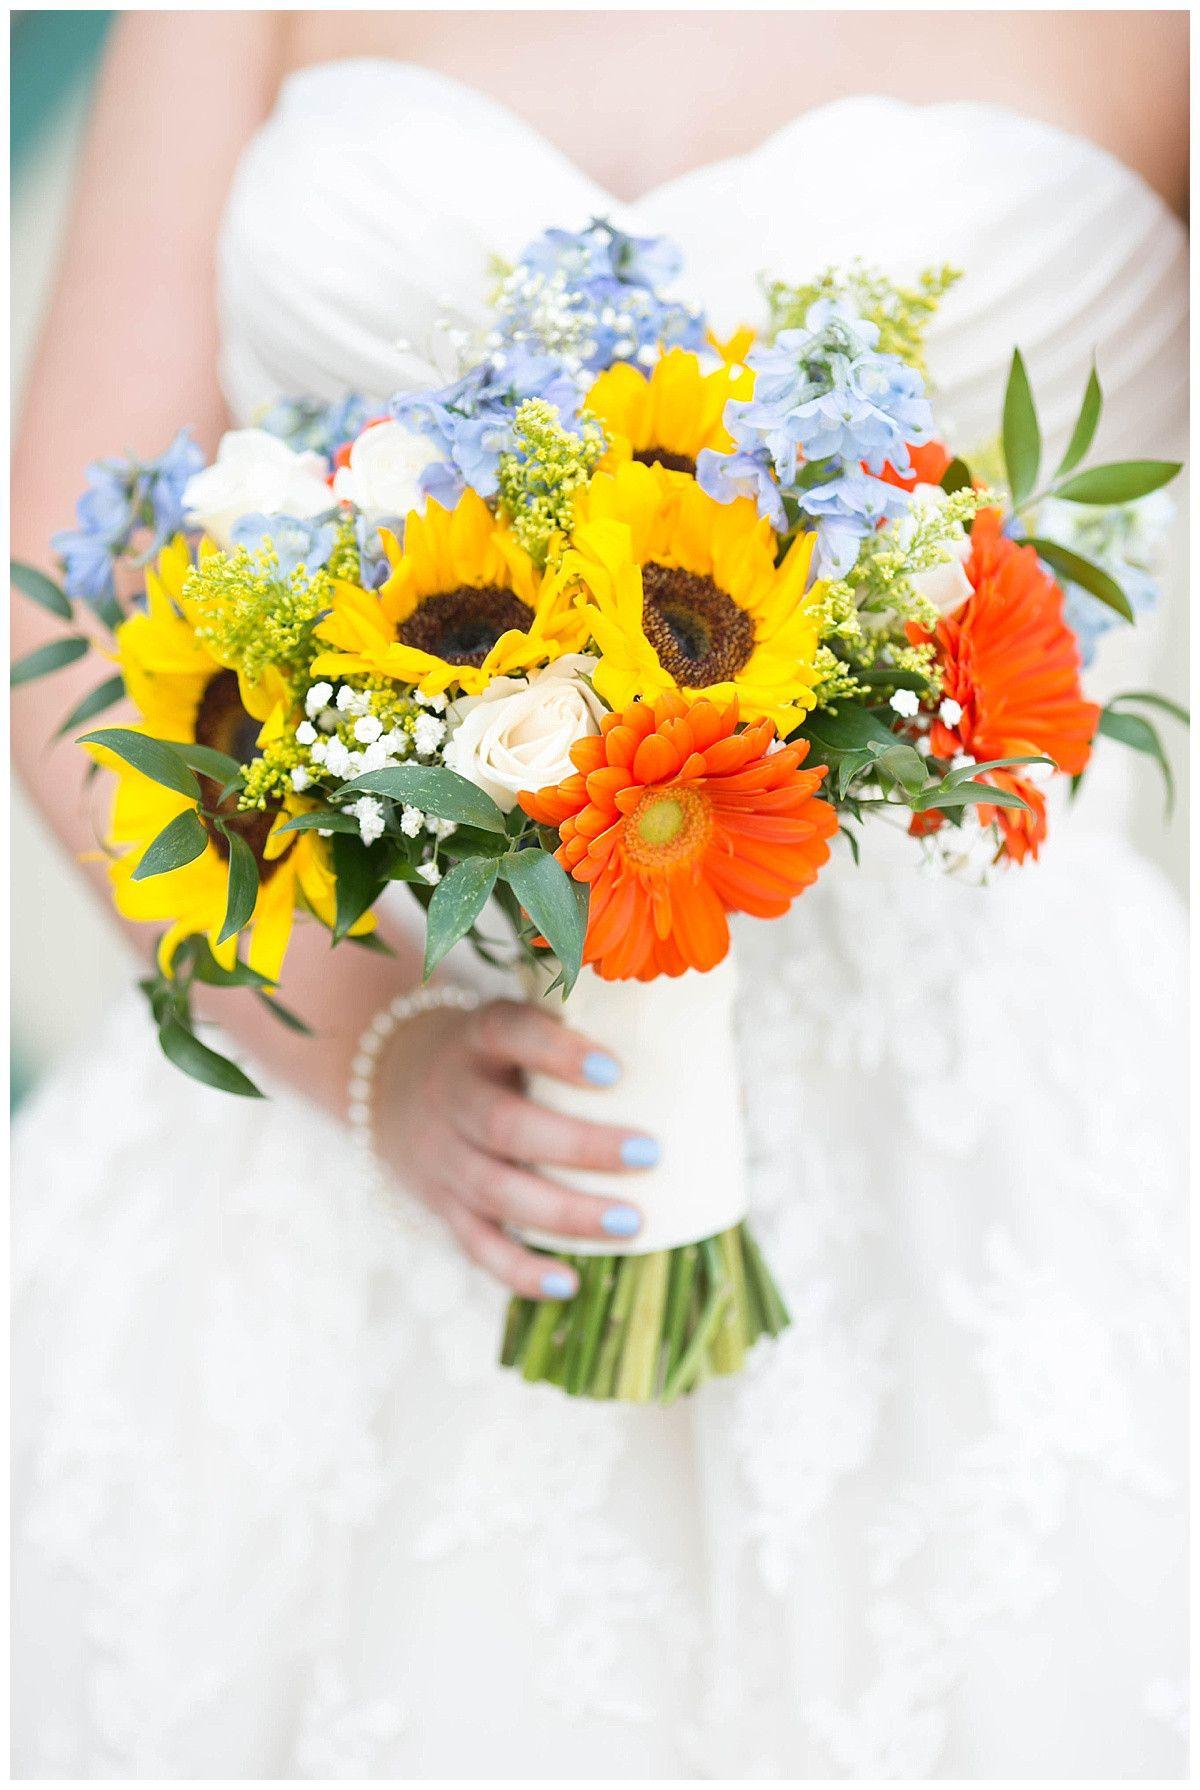 Summer wedding bouquet; sunflower wedding bouquet